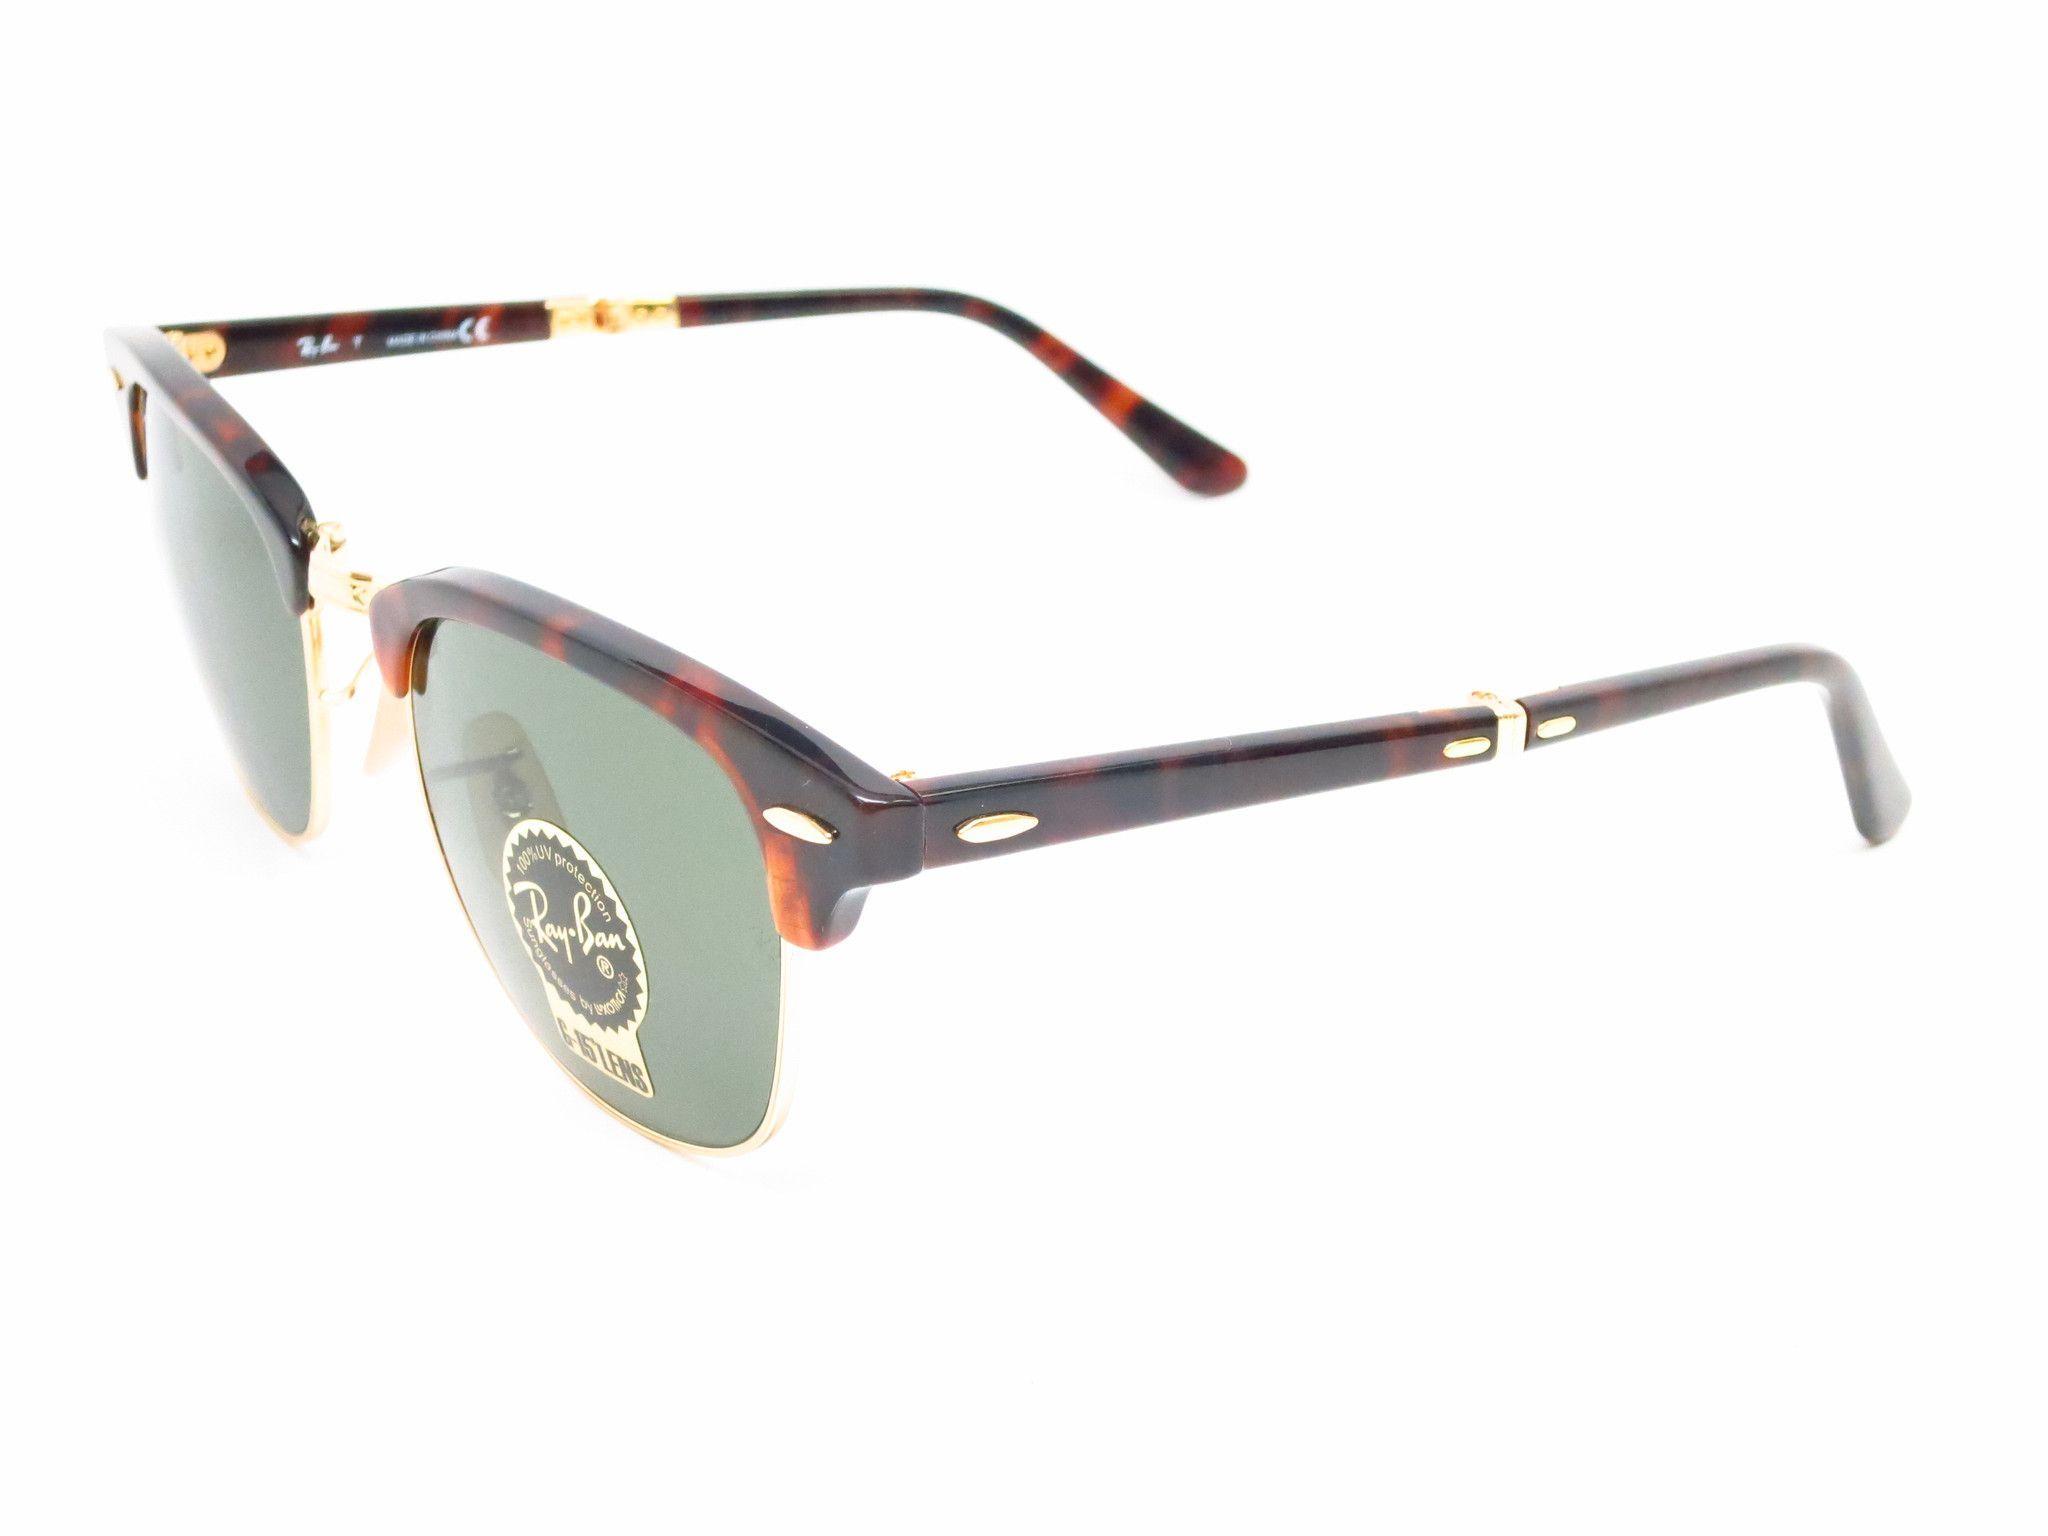 7ae7219cc6c Ray-Ban RB 2176 Clubmaster Folding 990 Red Havana Sunglasses